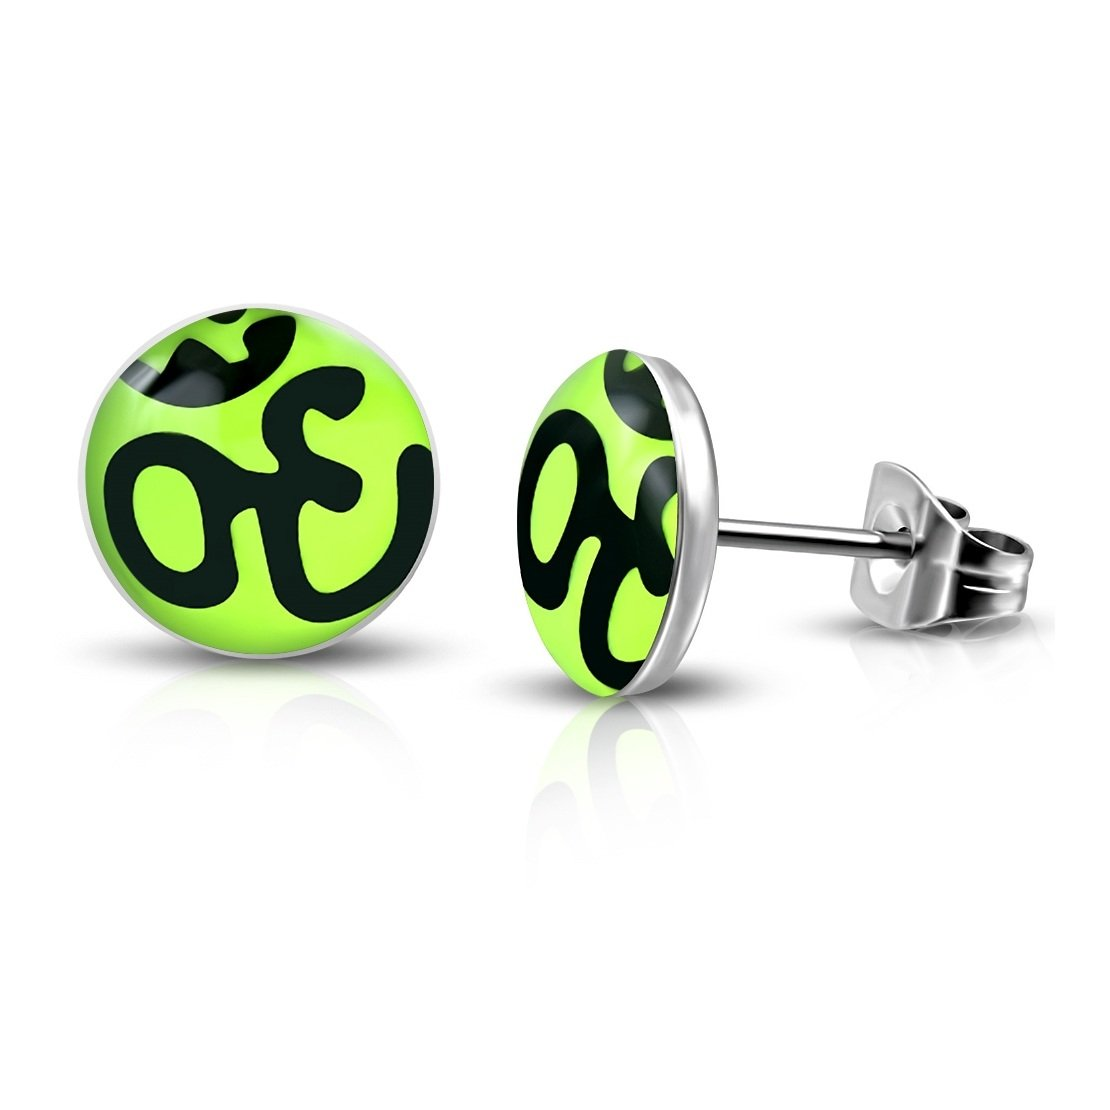 Pair Stainless Steel 3 Color Ohm Symbol Hindu Religious Lemon Green Circle Stud Earrings